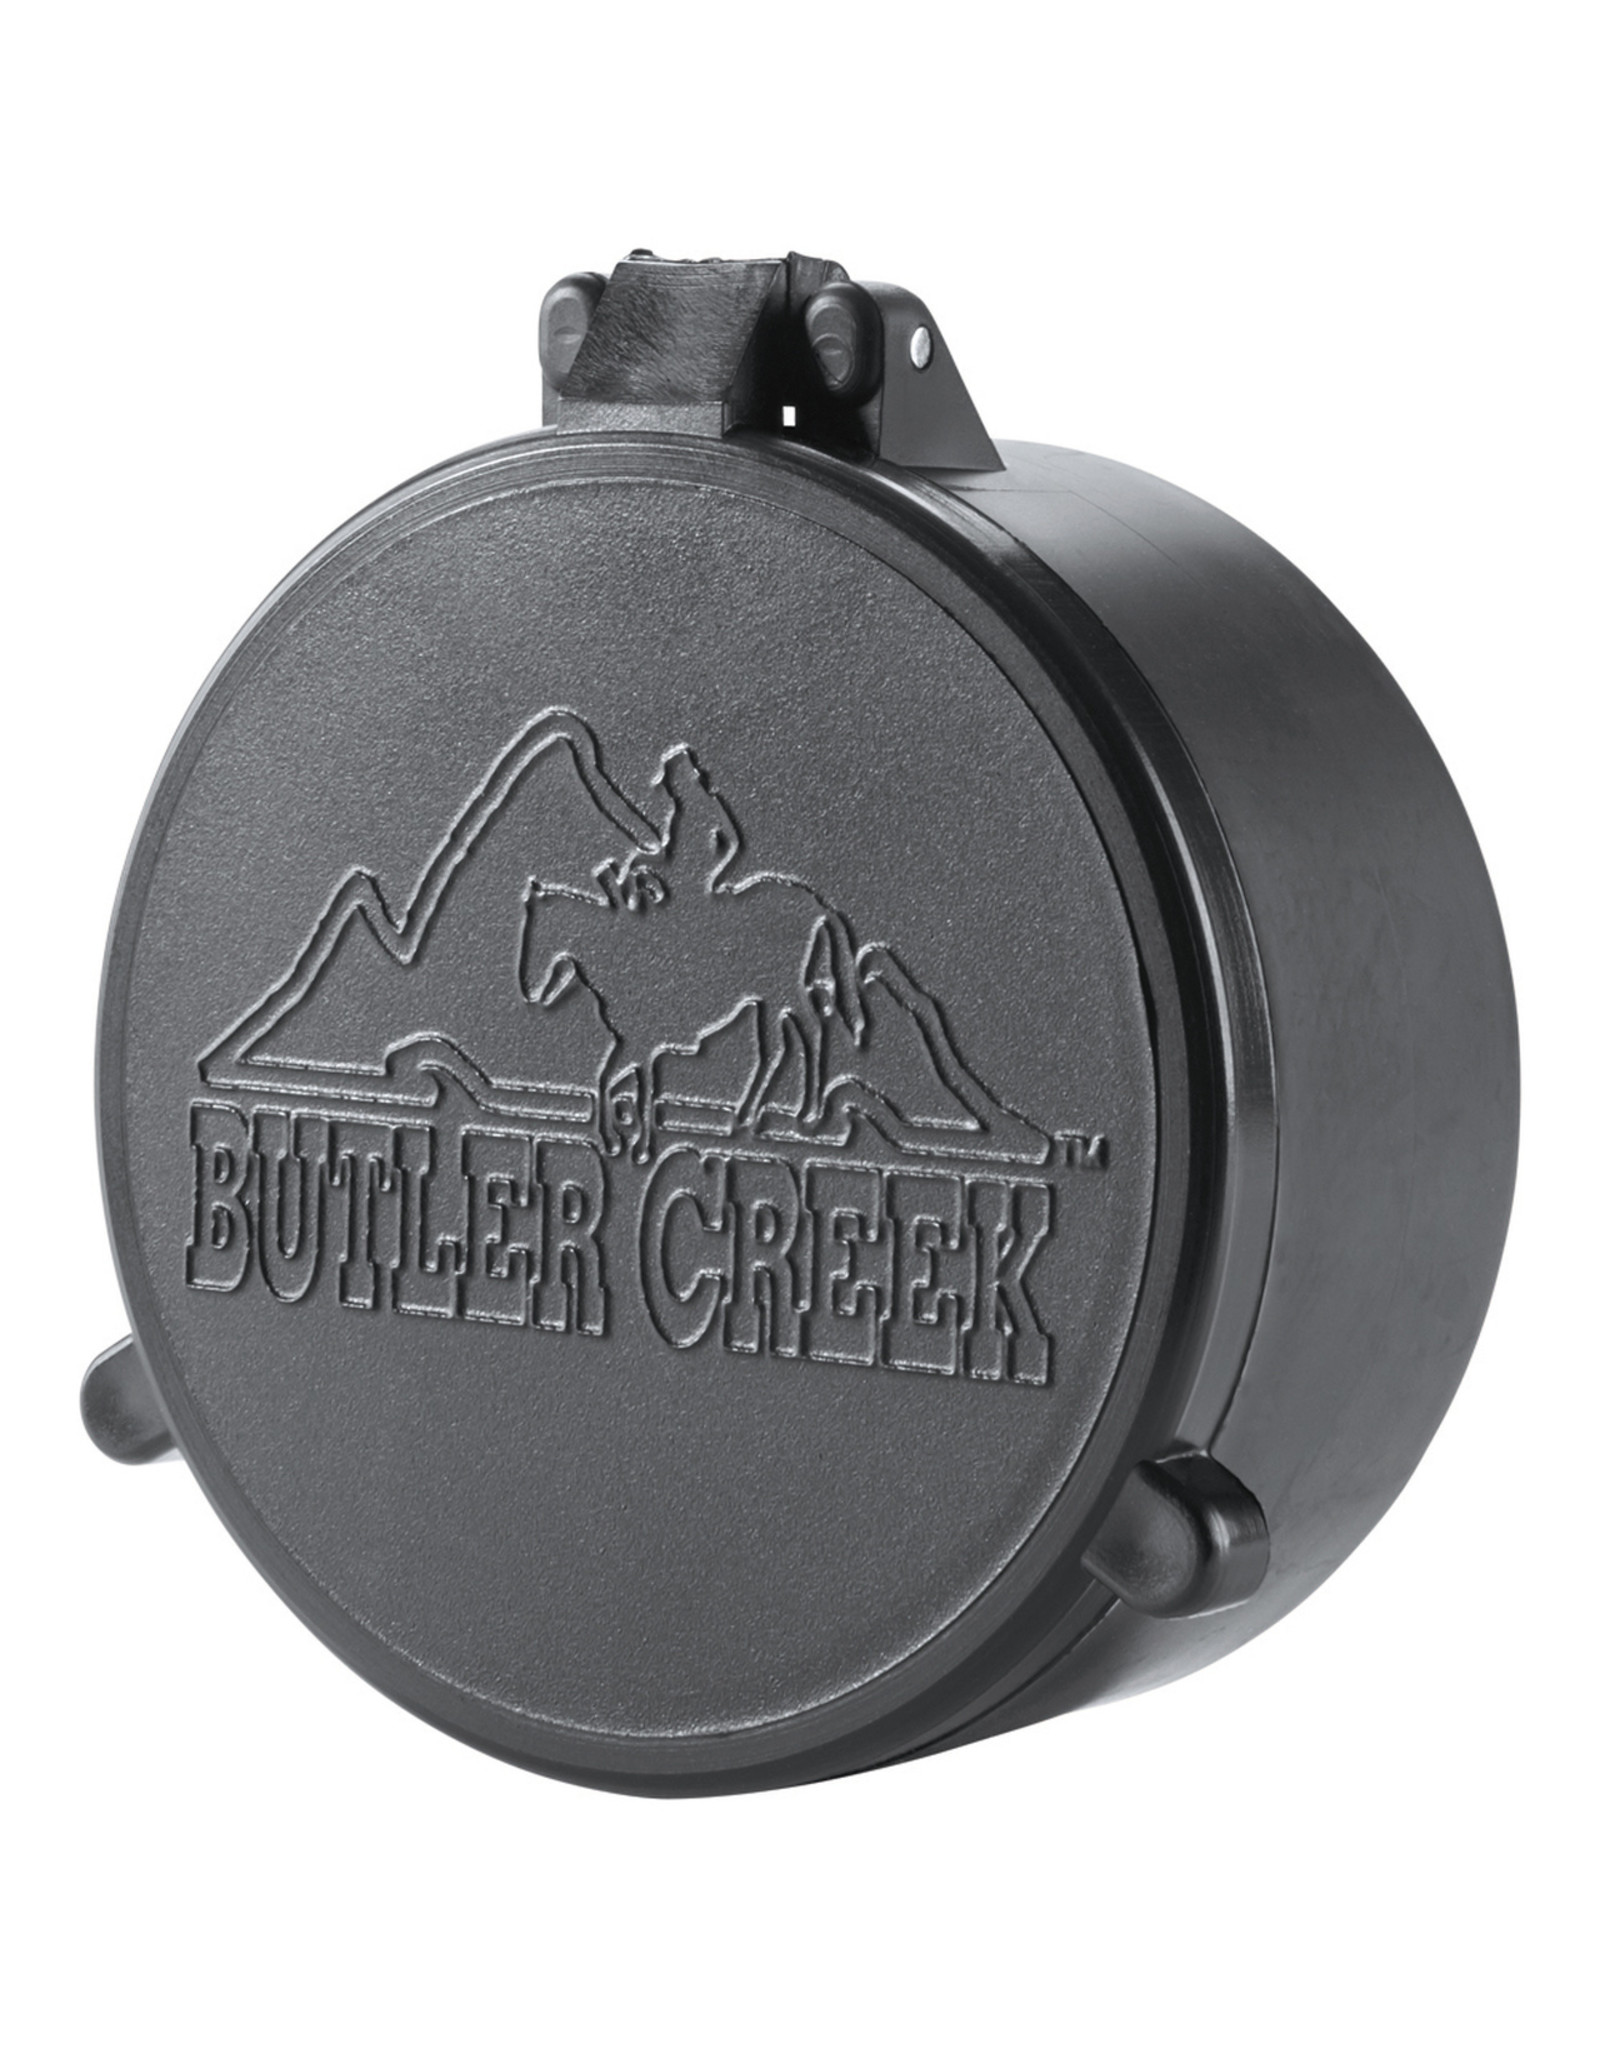 Butler Creek Butler Creek 25 OBJ Scope Cover